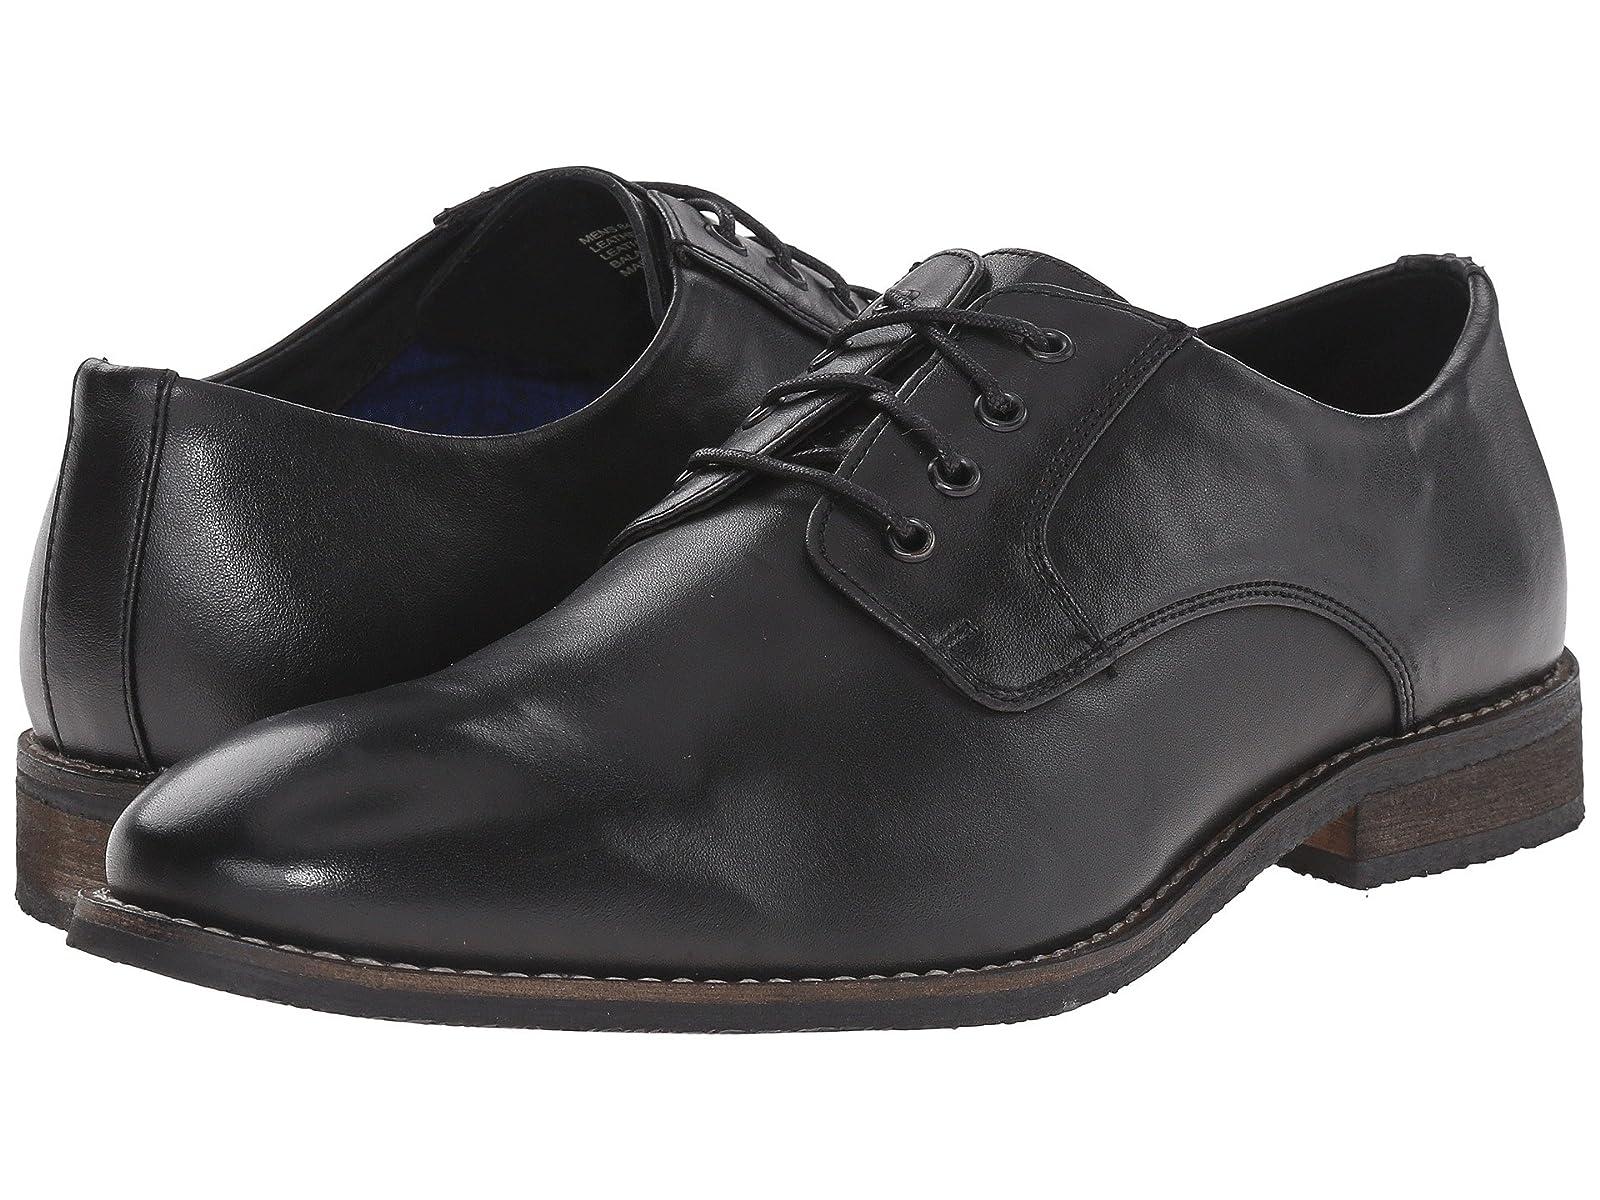 Nunn Bush Howell Plain Toe OxfordCheap and distinctive eye-catching shoes